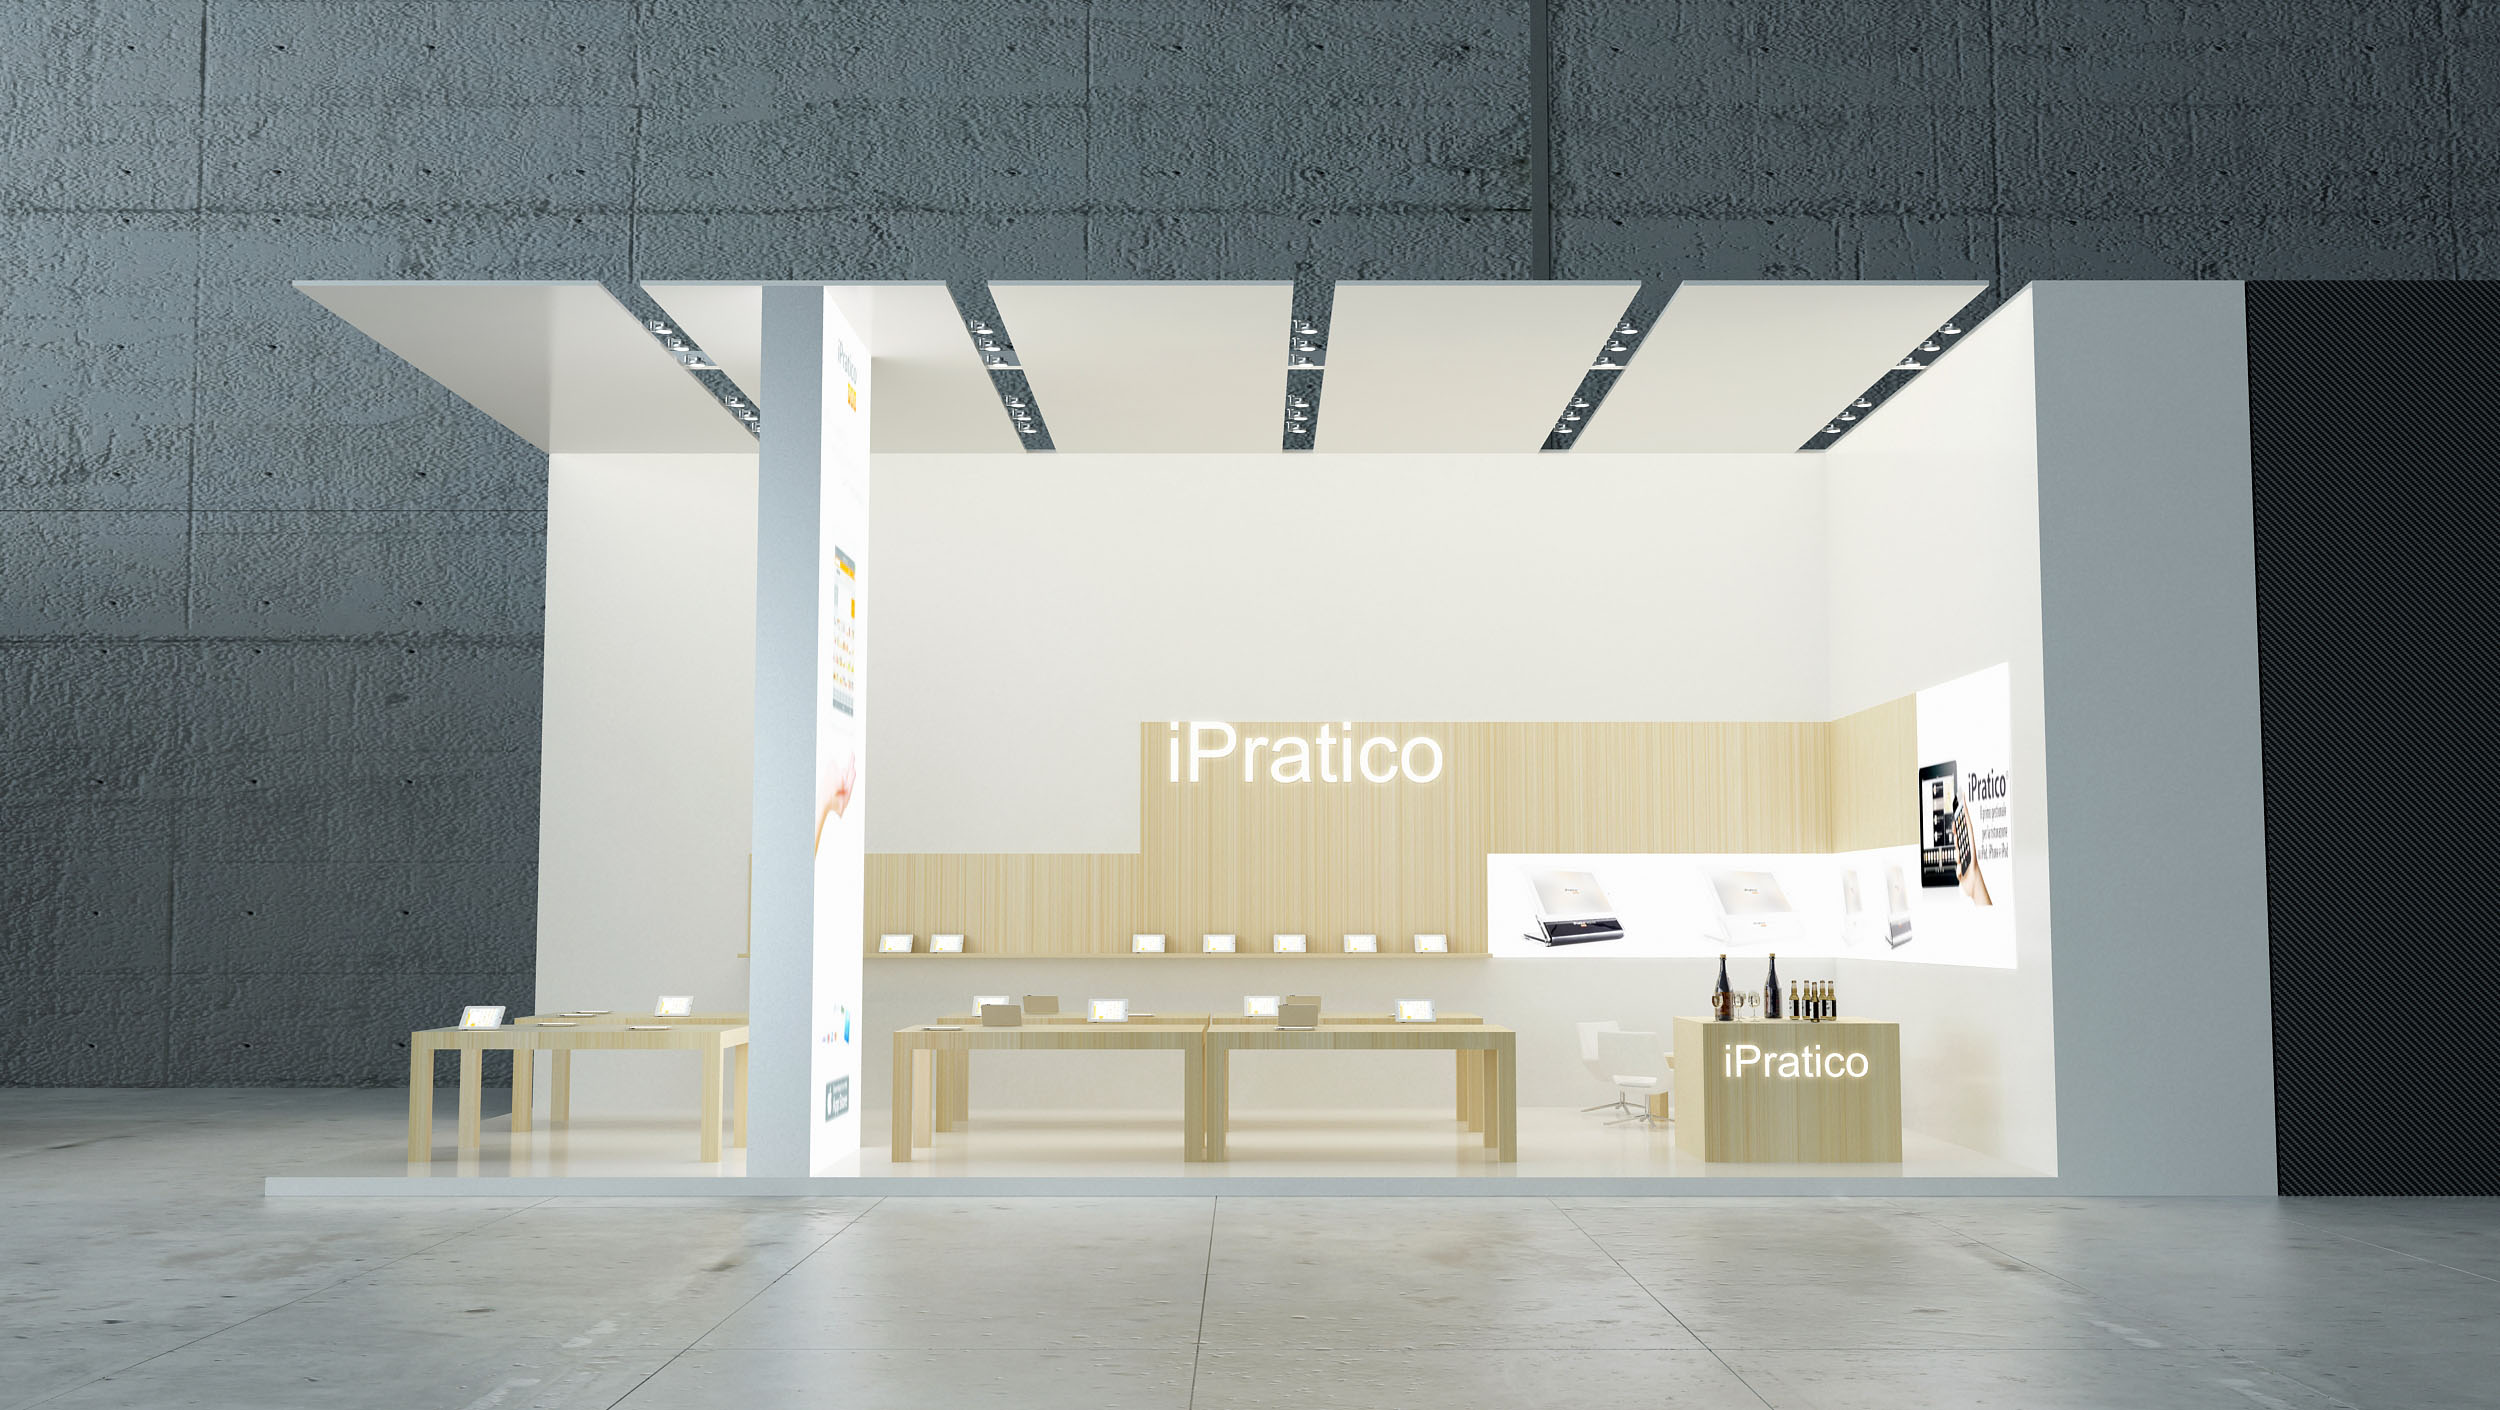 IPratico